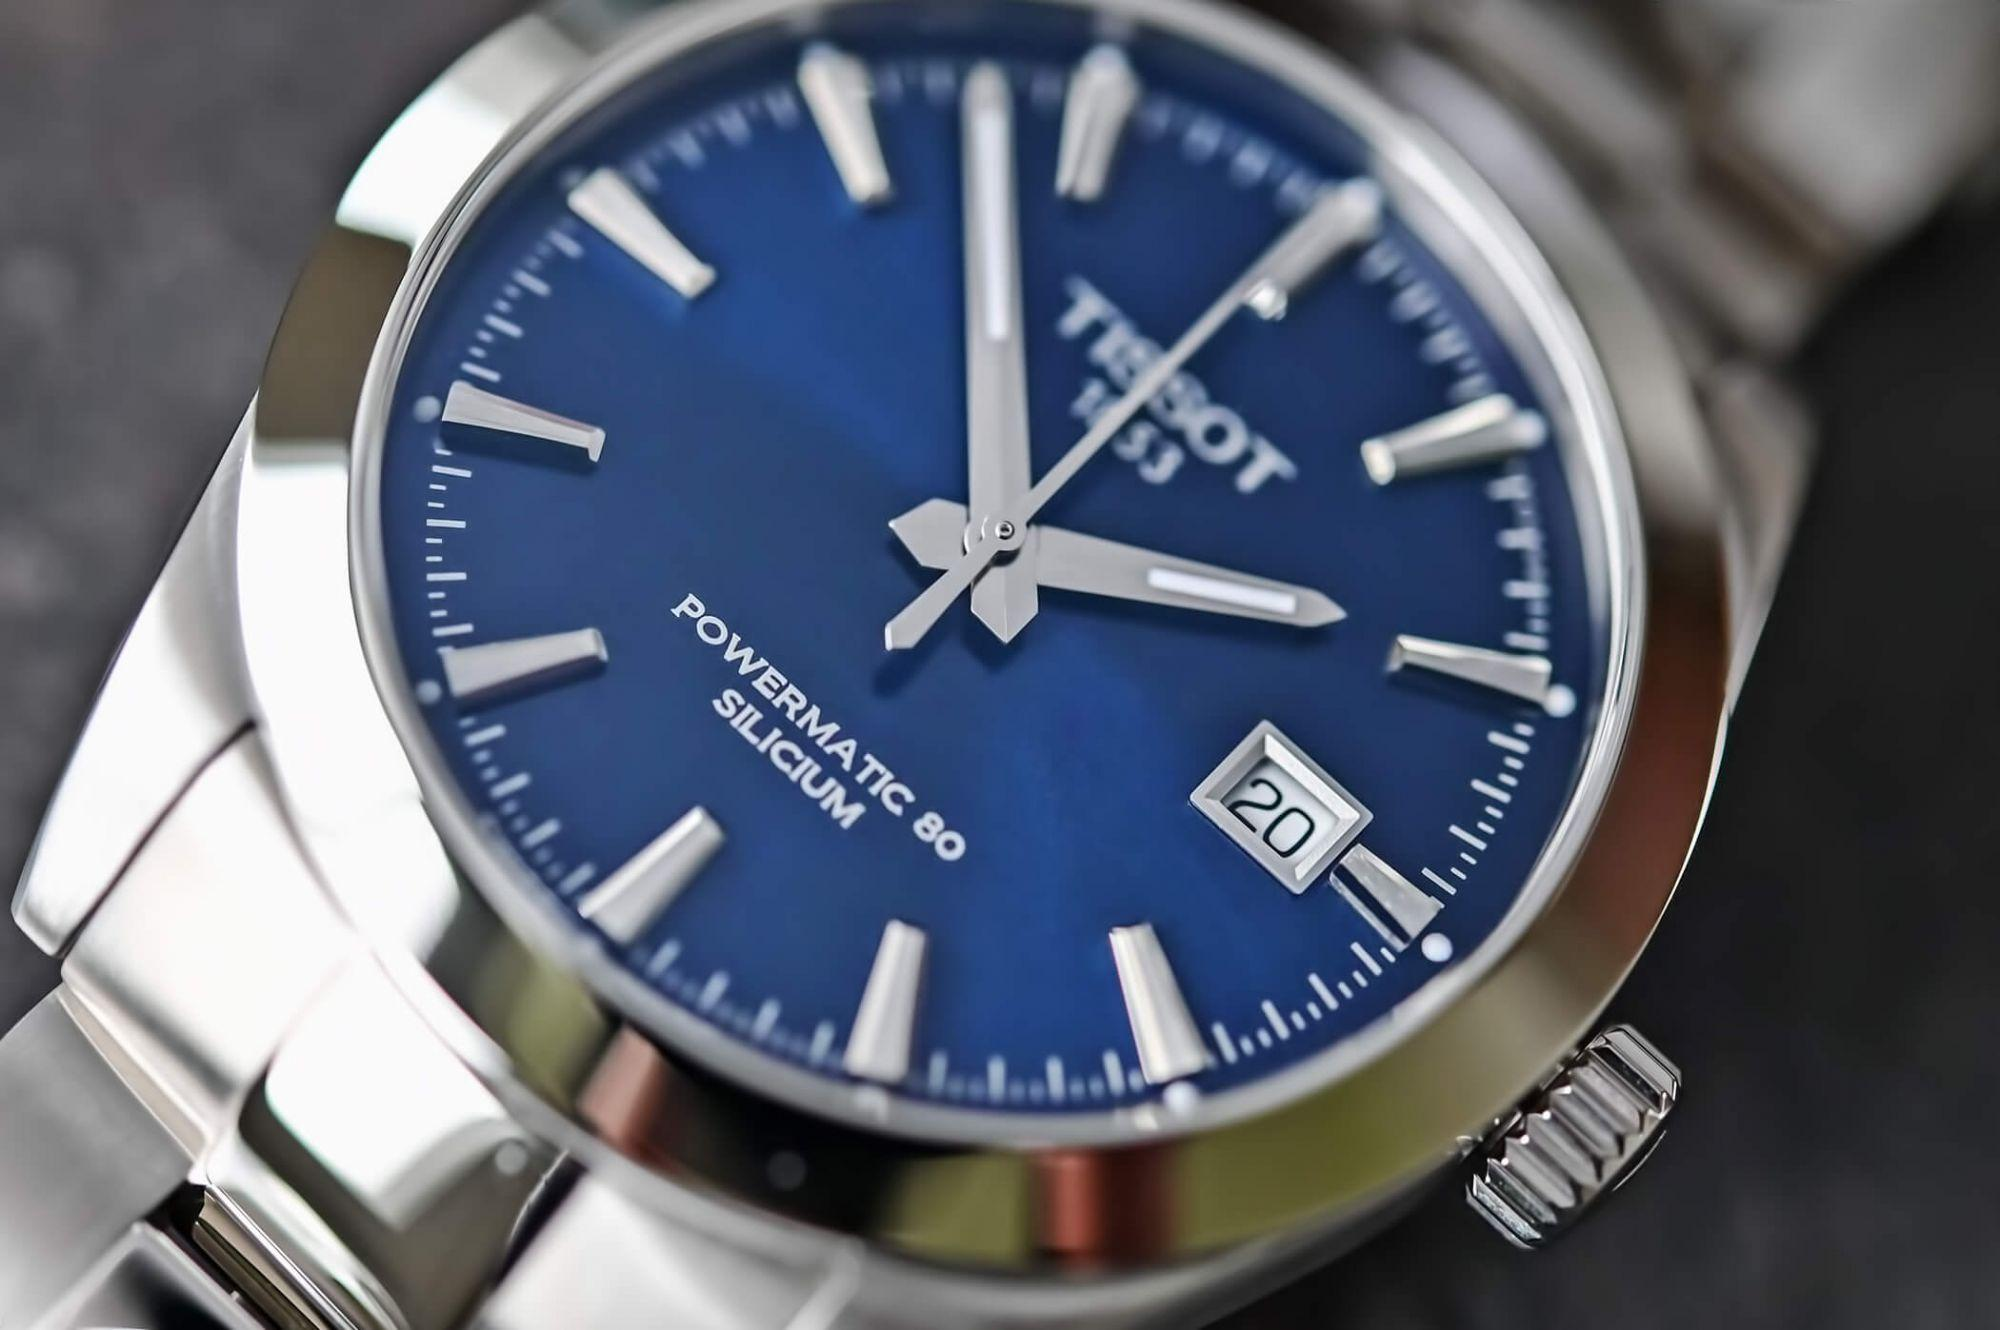 Наручные часы Tissot Gentleman Powermatic 80 Silicium